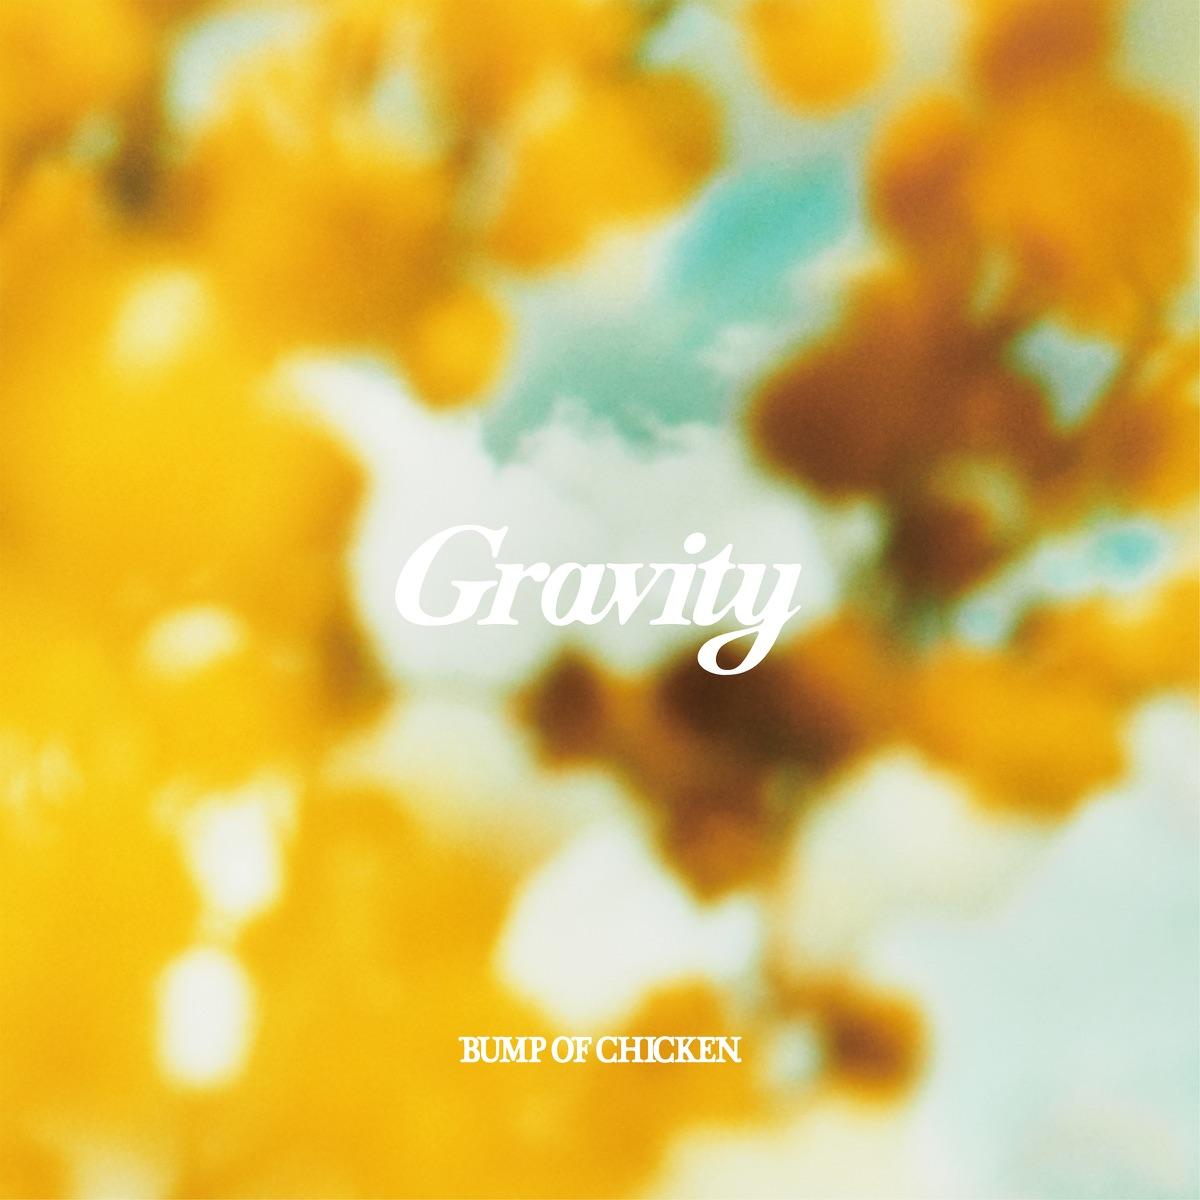 『BUMP OF CHICKEN - Gravity 歌詞』収録の『Gravity/アカシア』ジャケット